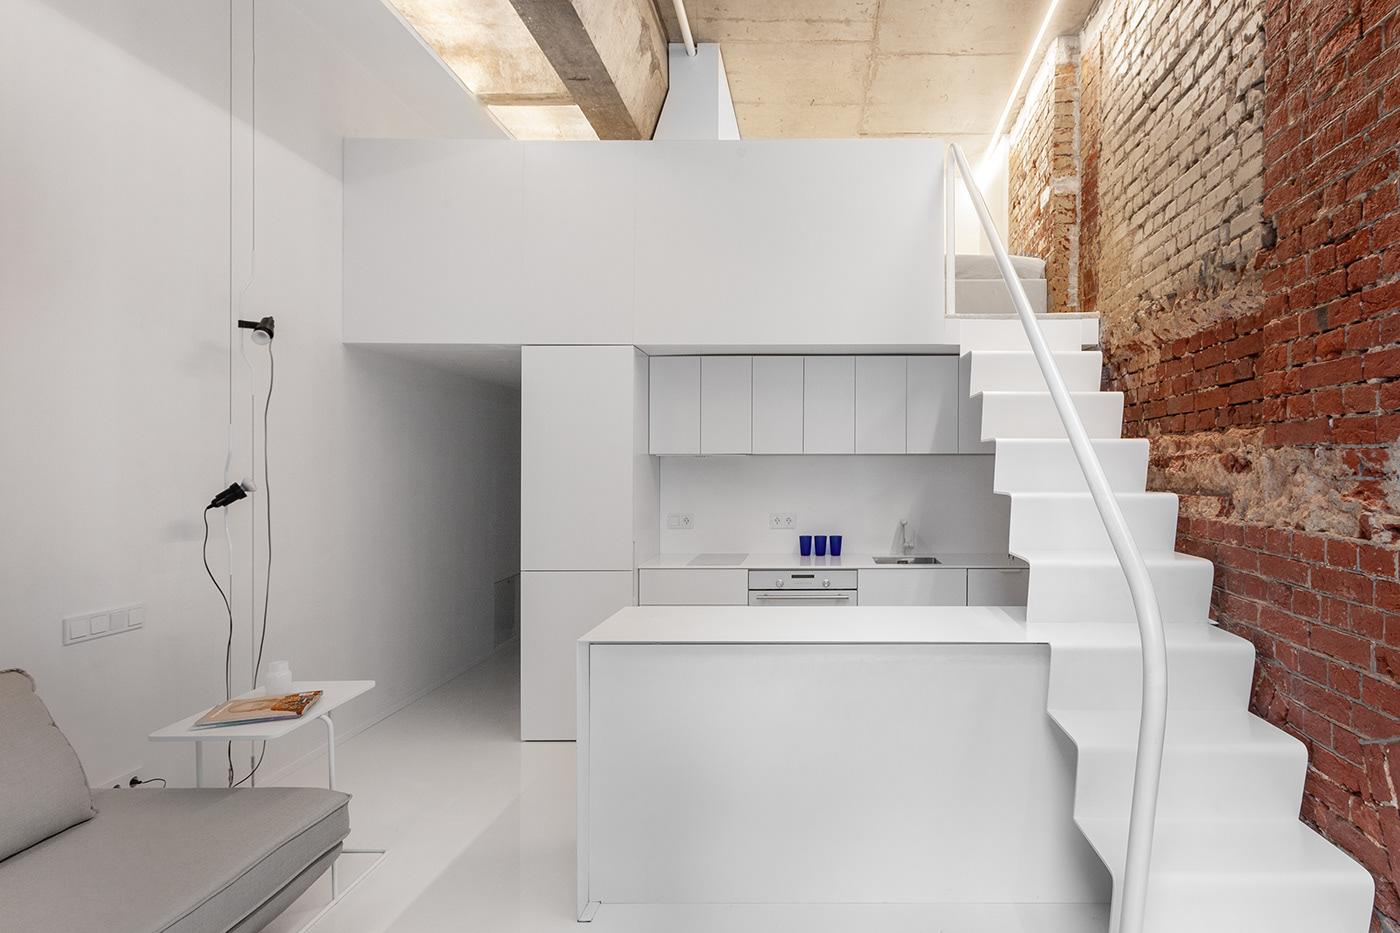 Image may contain: wall, modern and interior